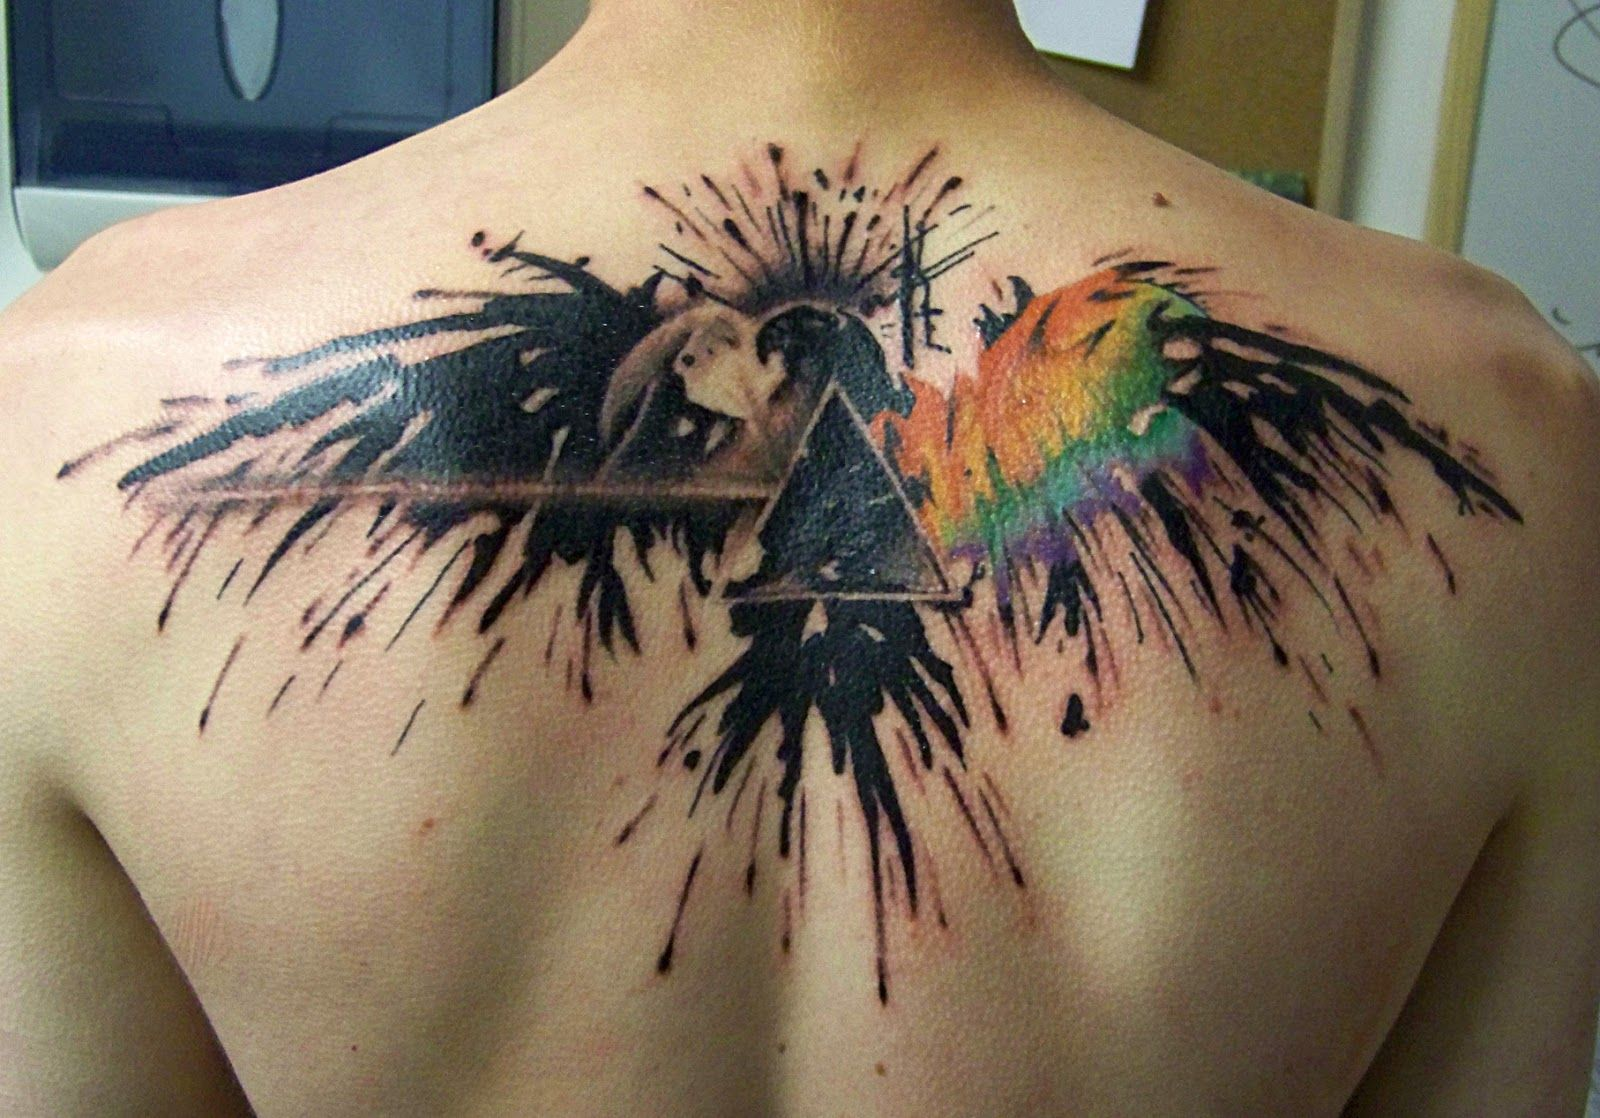 Aguila En La Espalda eagle back | tatuajes, tatuajes retro, alas tatuaje